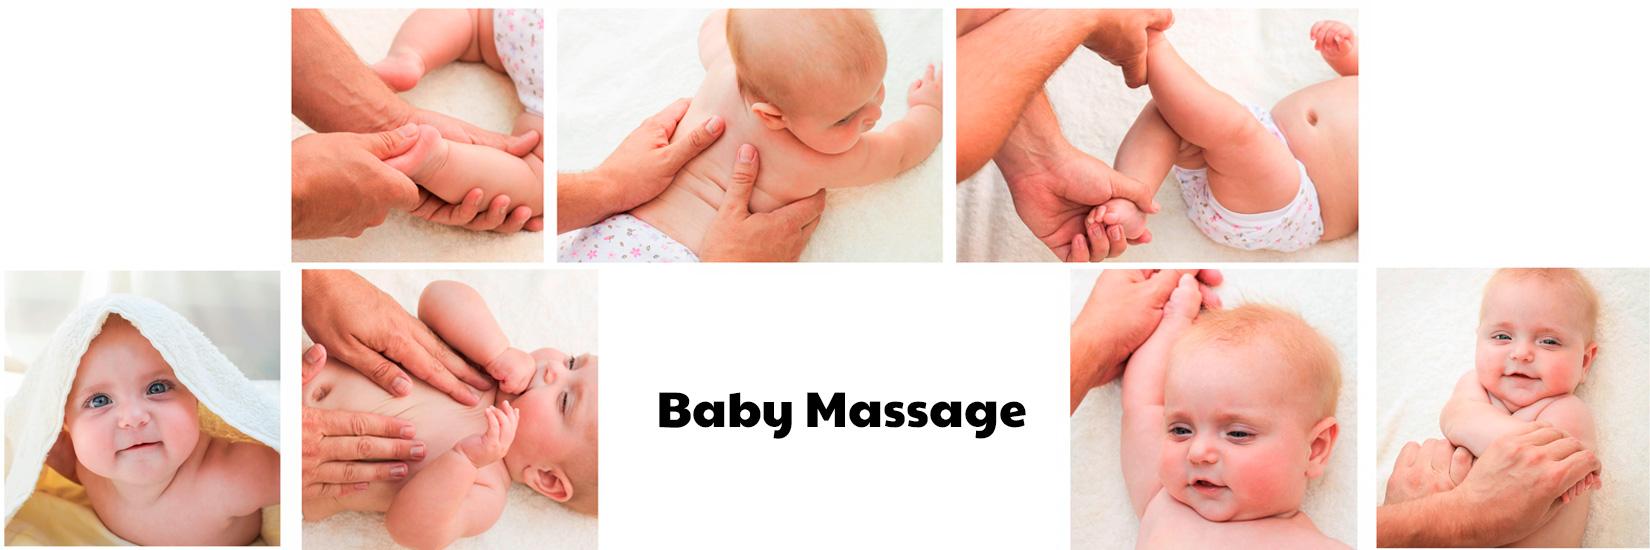 Benefits of Baby Massage, Dubai ✿Cucciku✿